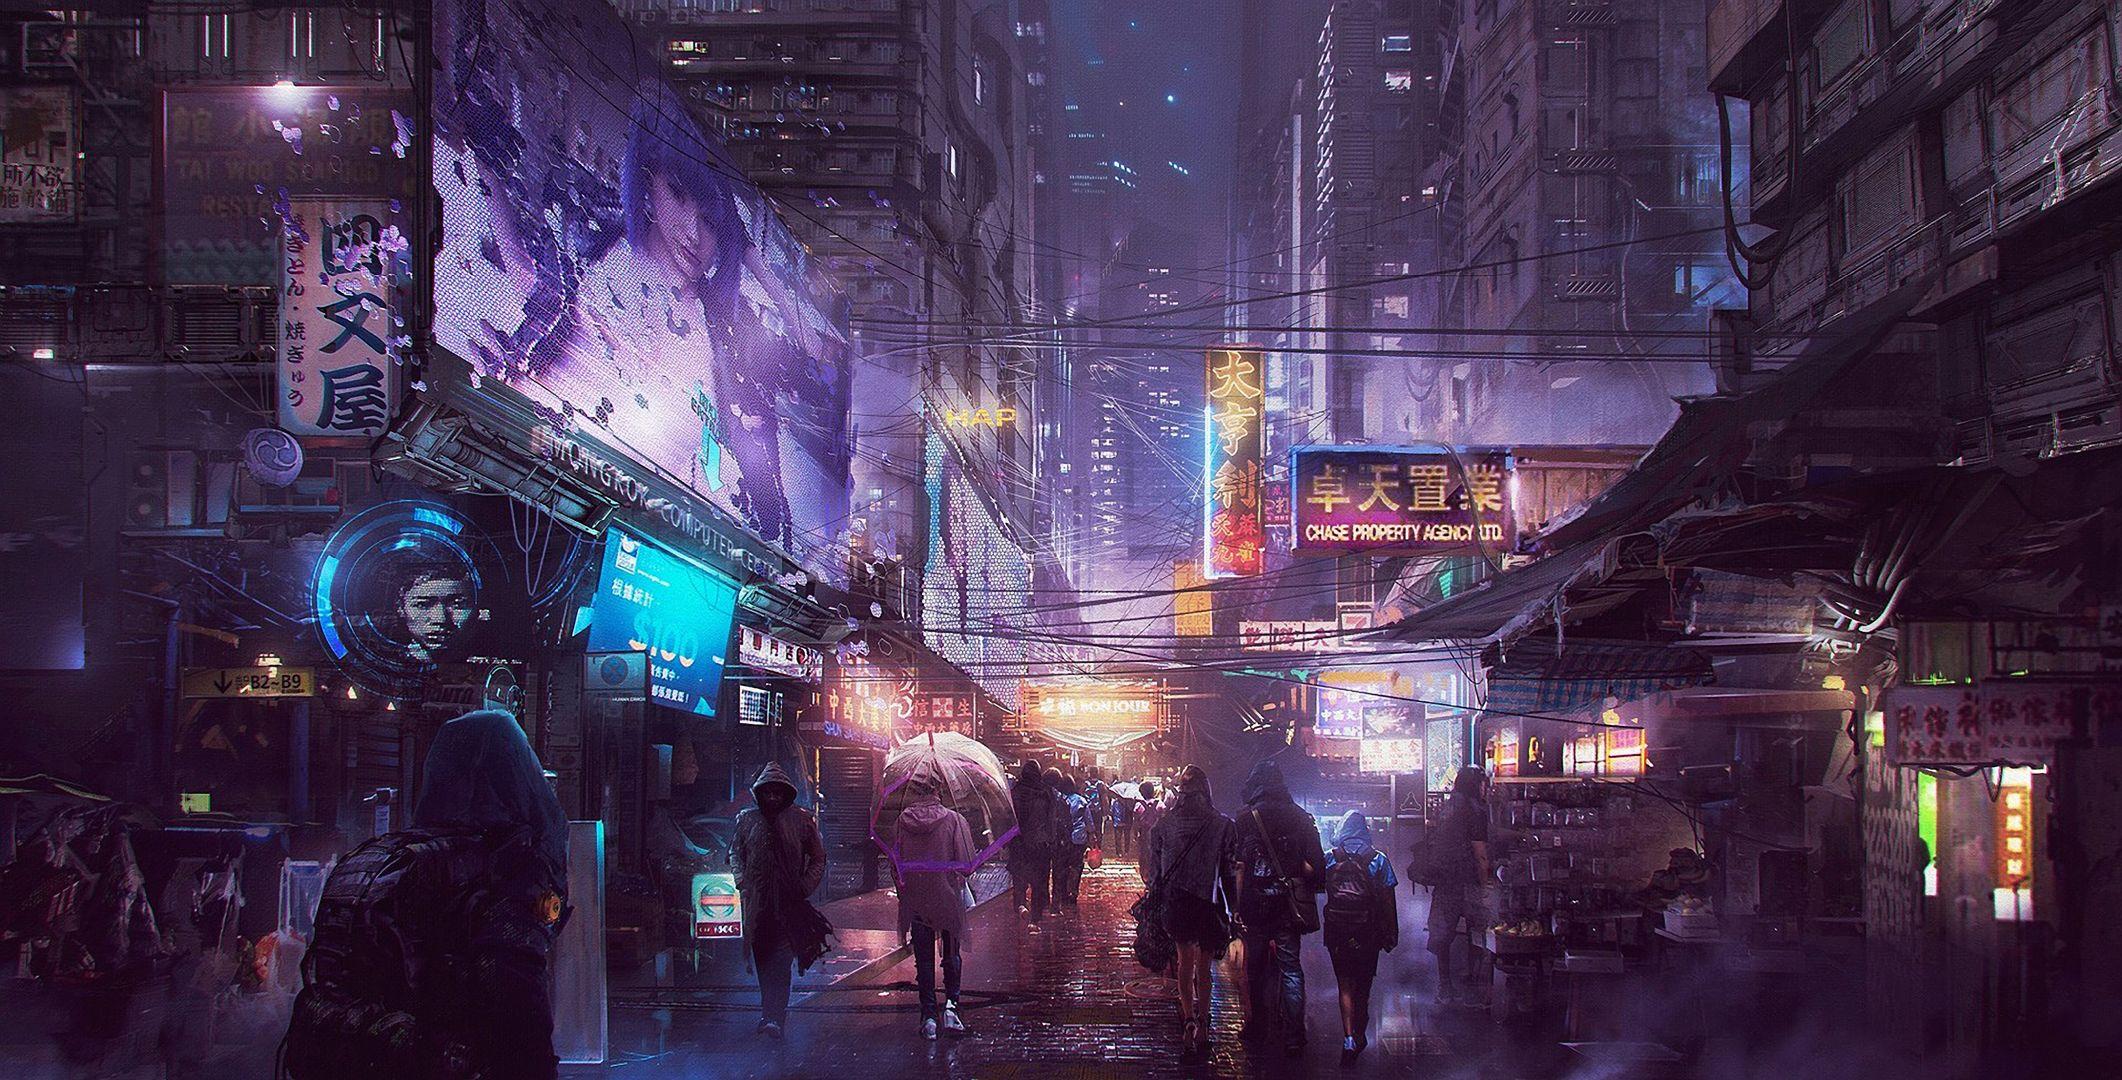 Cyberpunk Busy Street Hdwallpaper wallpaper image Hd